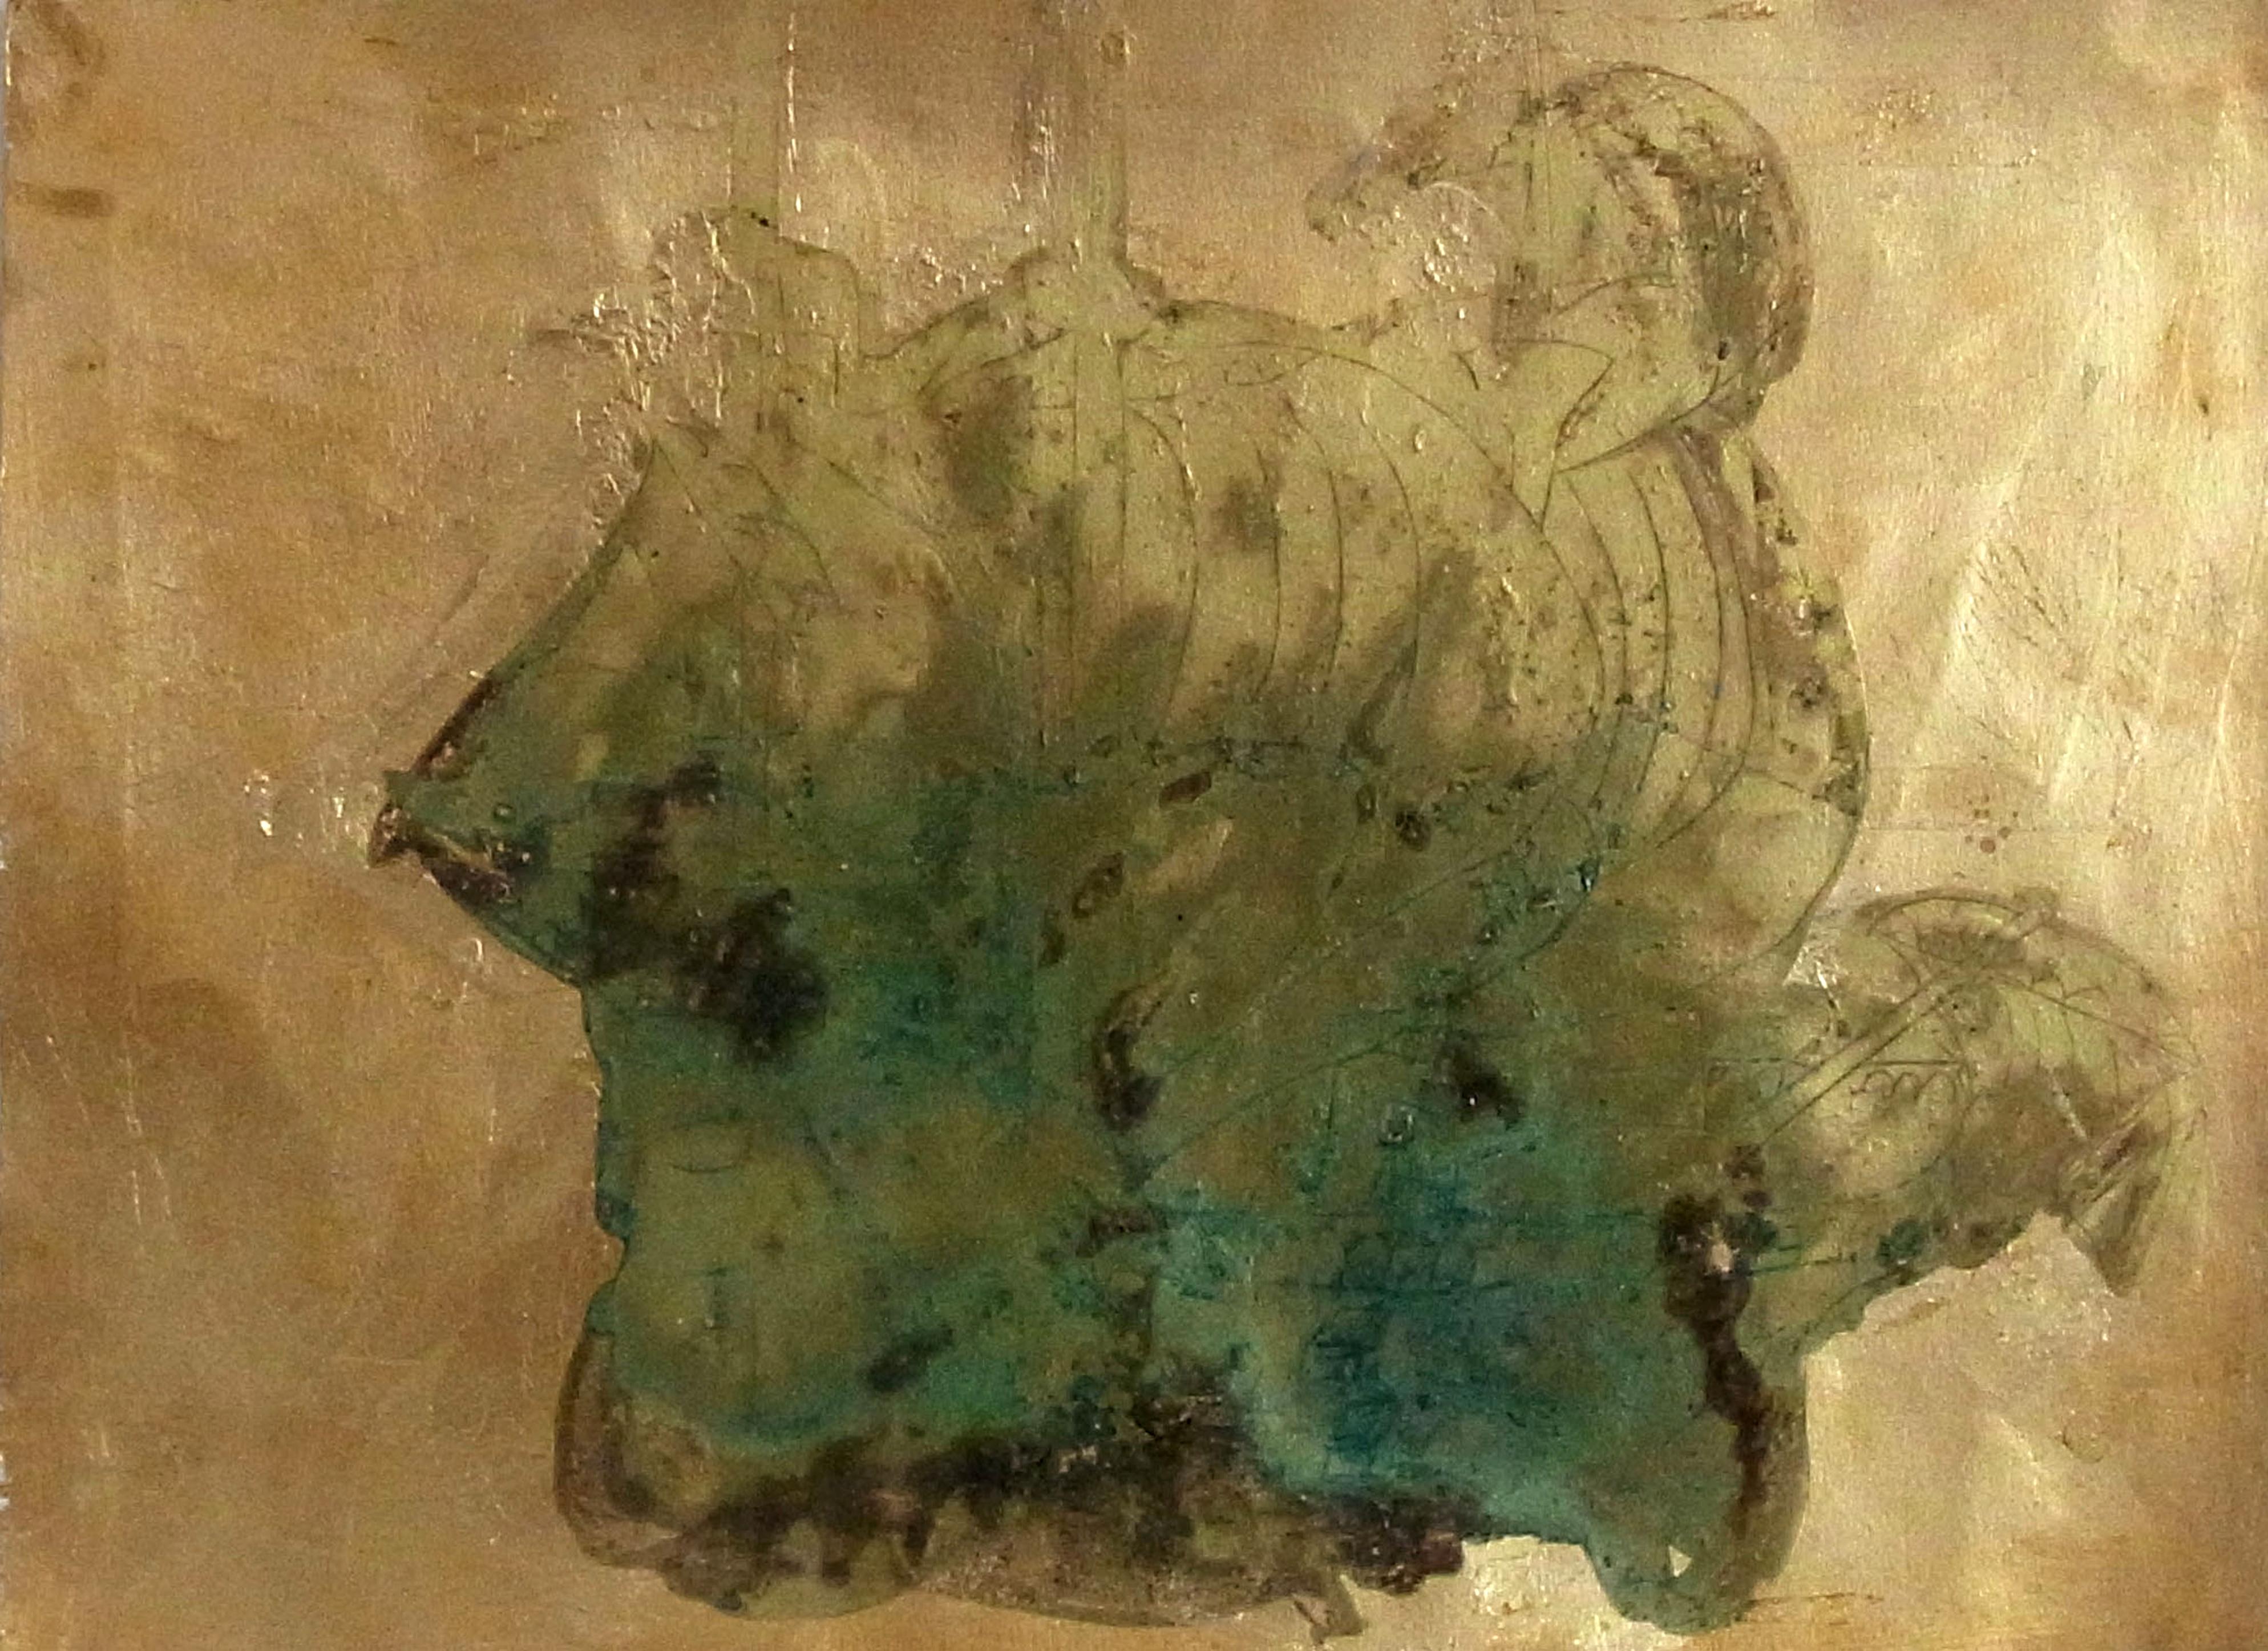 Colonialism Lack auf Blattgold, 42x29,7 cm © Melody LaVerne Bettencourt 2012